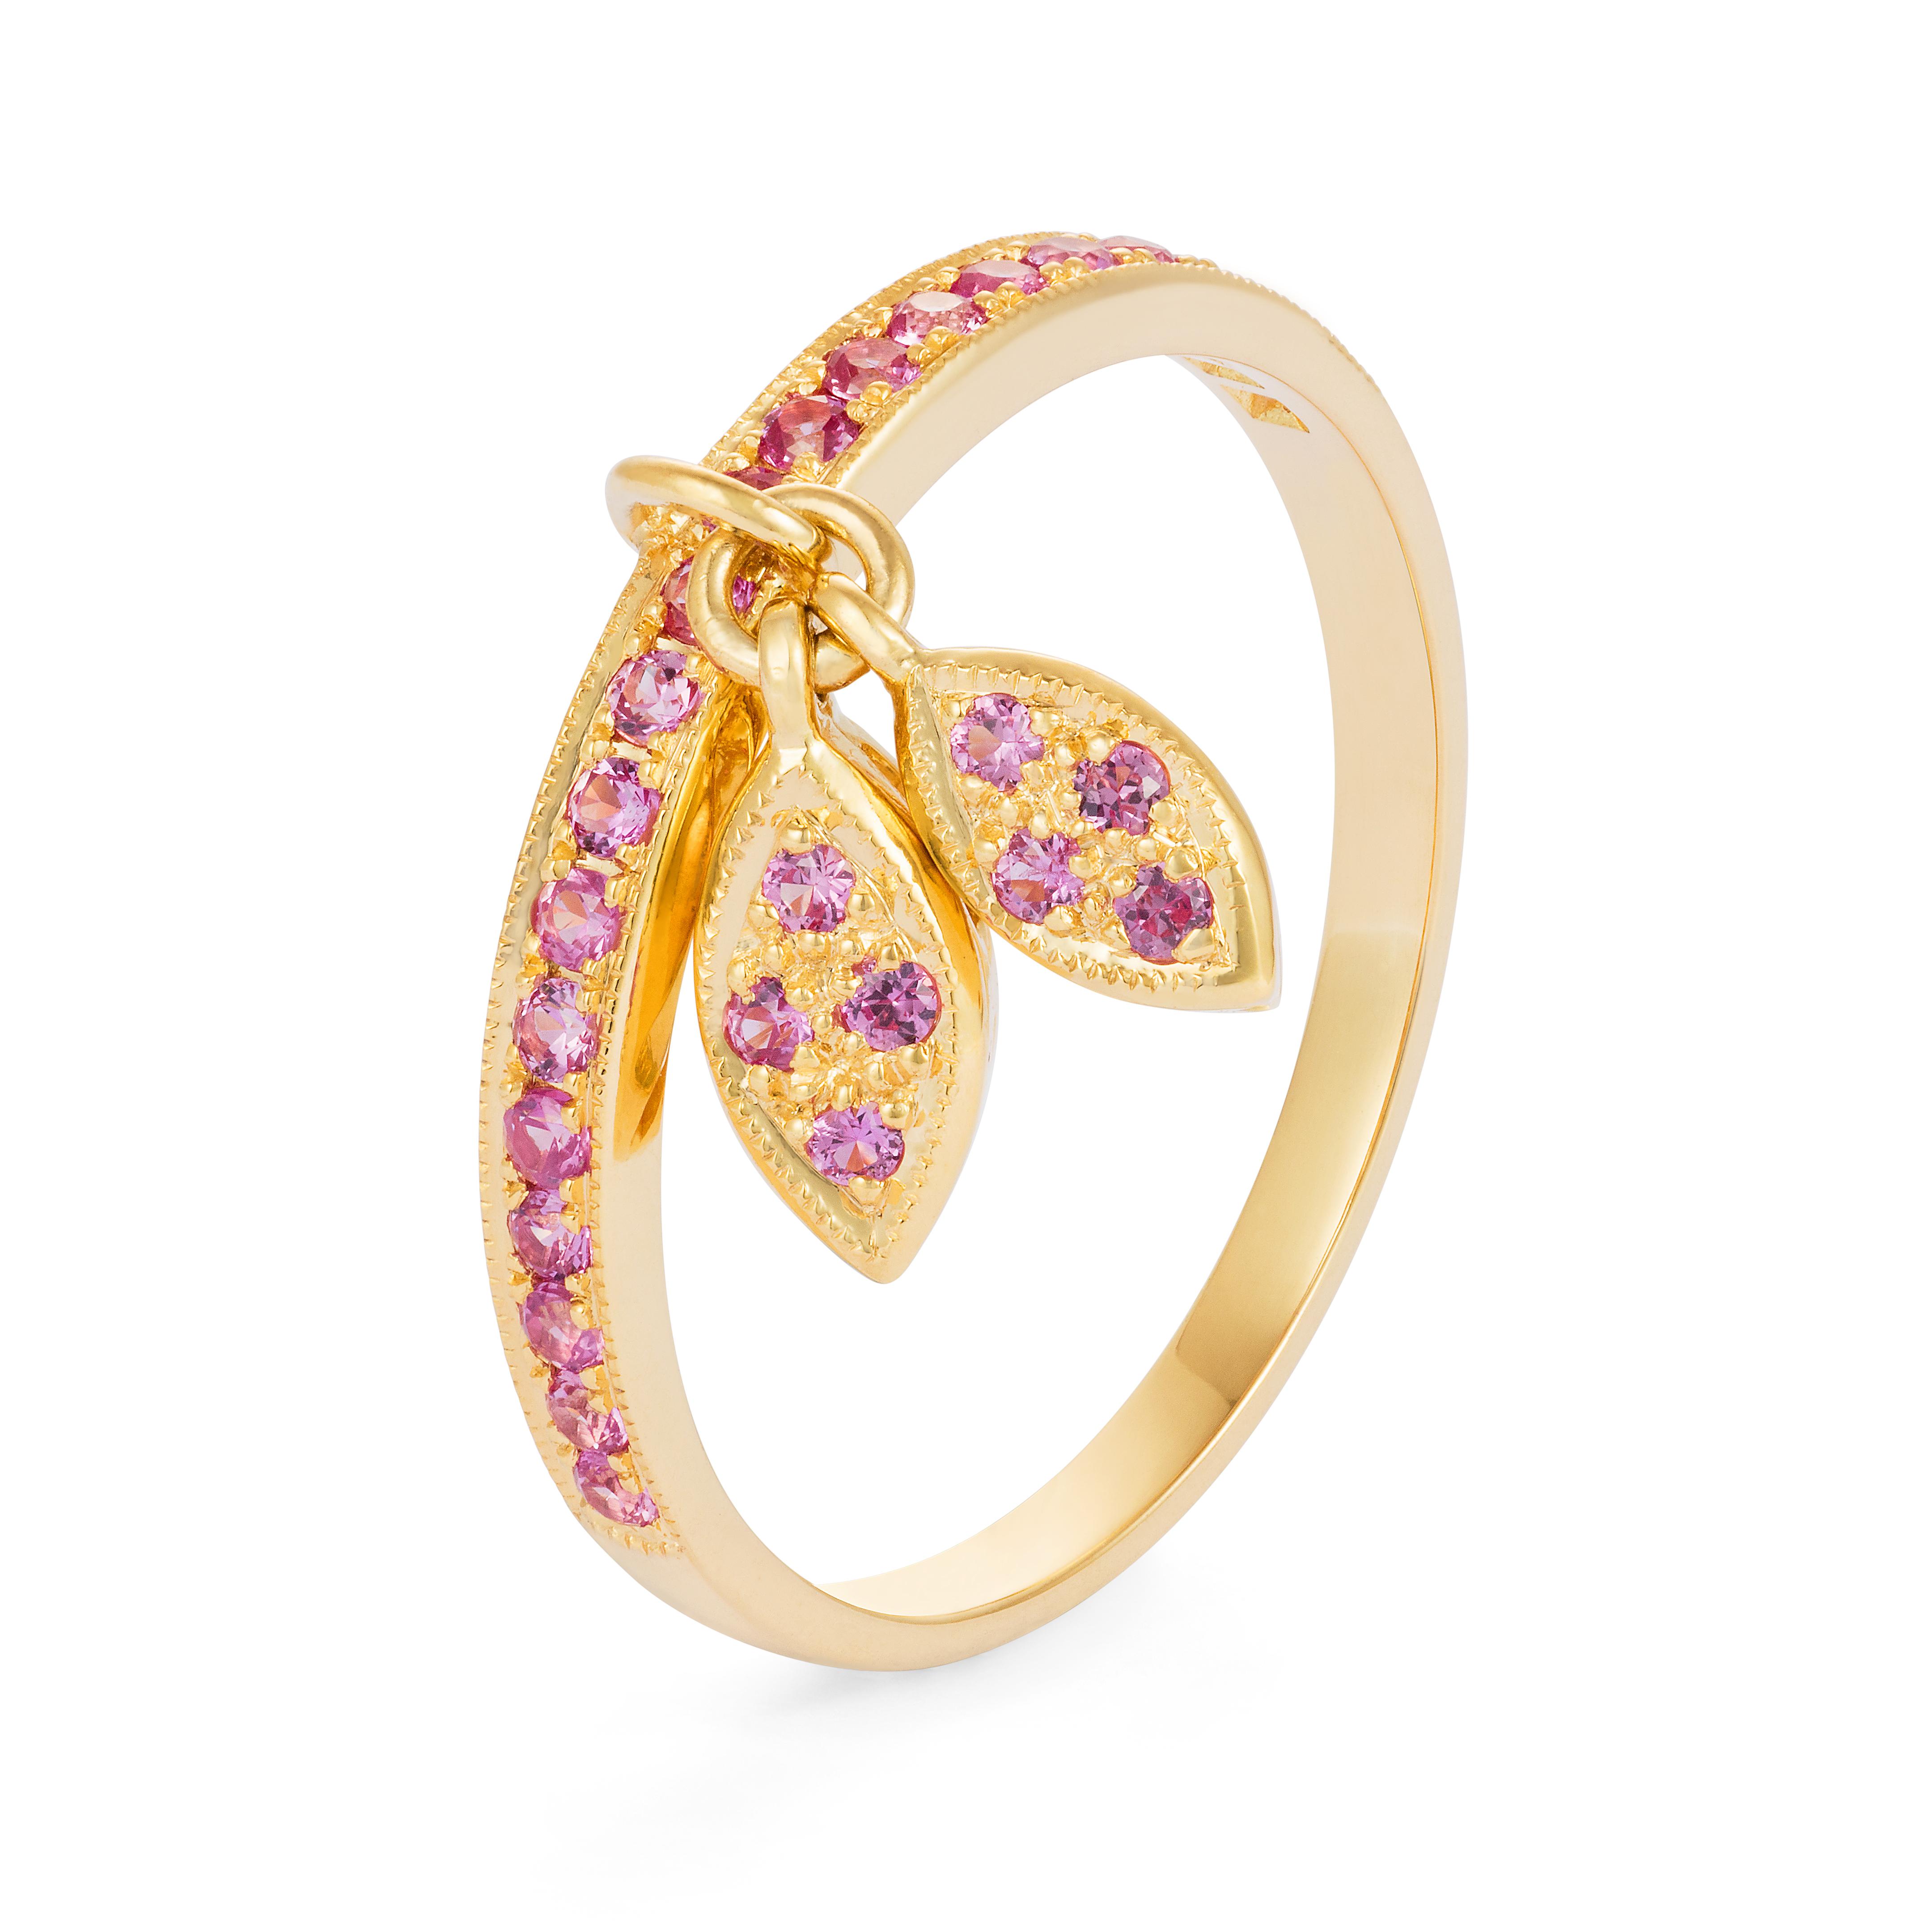 Diamond Leaf Ring – Pink Sapphires 18k Gold